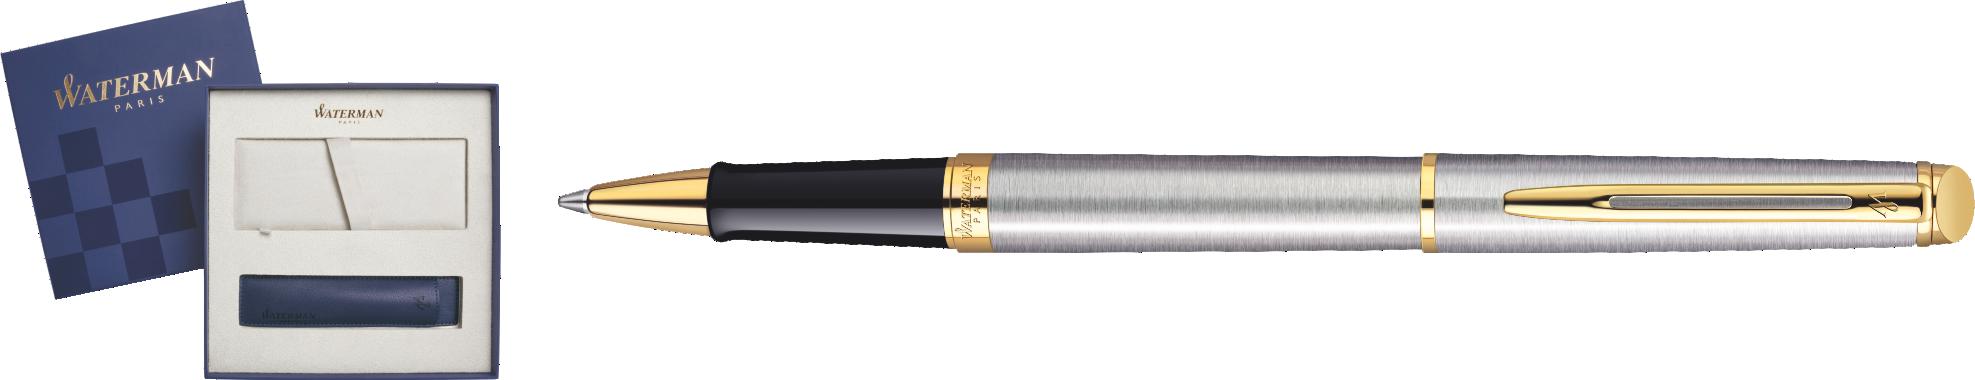 S0920350Cover Waterman Hemisphere Подарочный набор Ручка-роллер   Essential, Stainless Steel GT  с чехлом